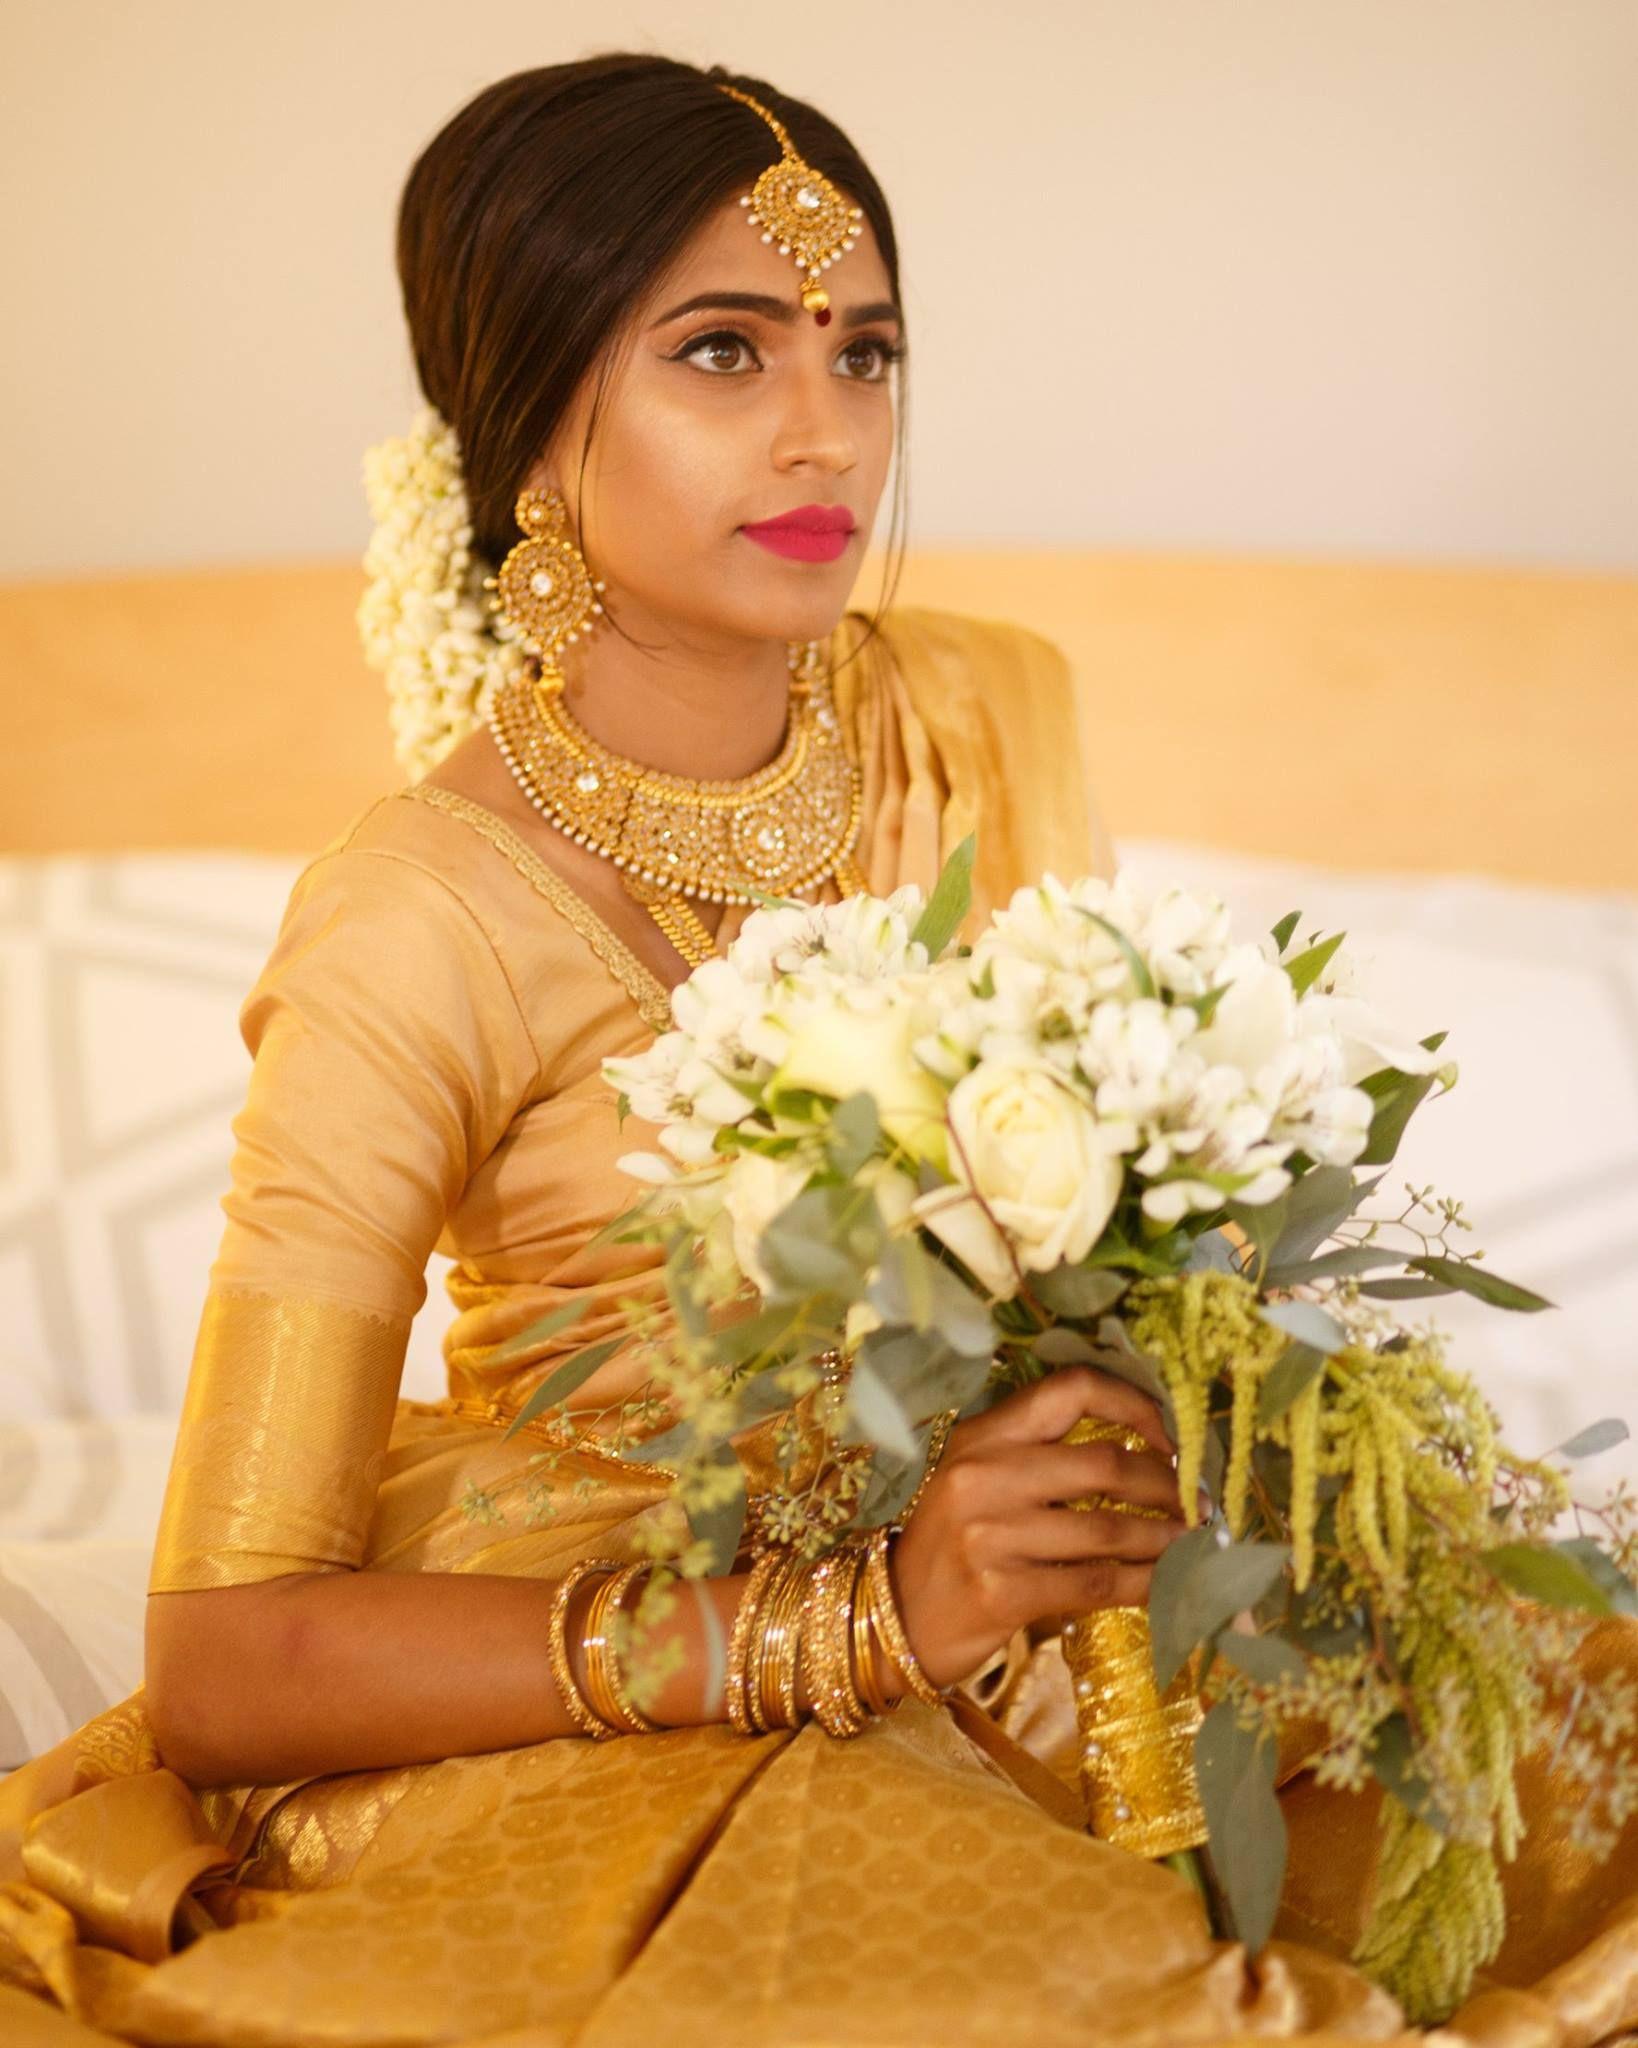 Indian Bridal Makeup Bridal Makeup Indian Bridal Hair Bridal Hair South Asian Bri Pakistani Bridal Makeup Wedding Dresses With Flowers Wedding Hair Flowers